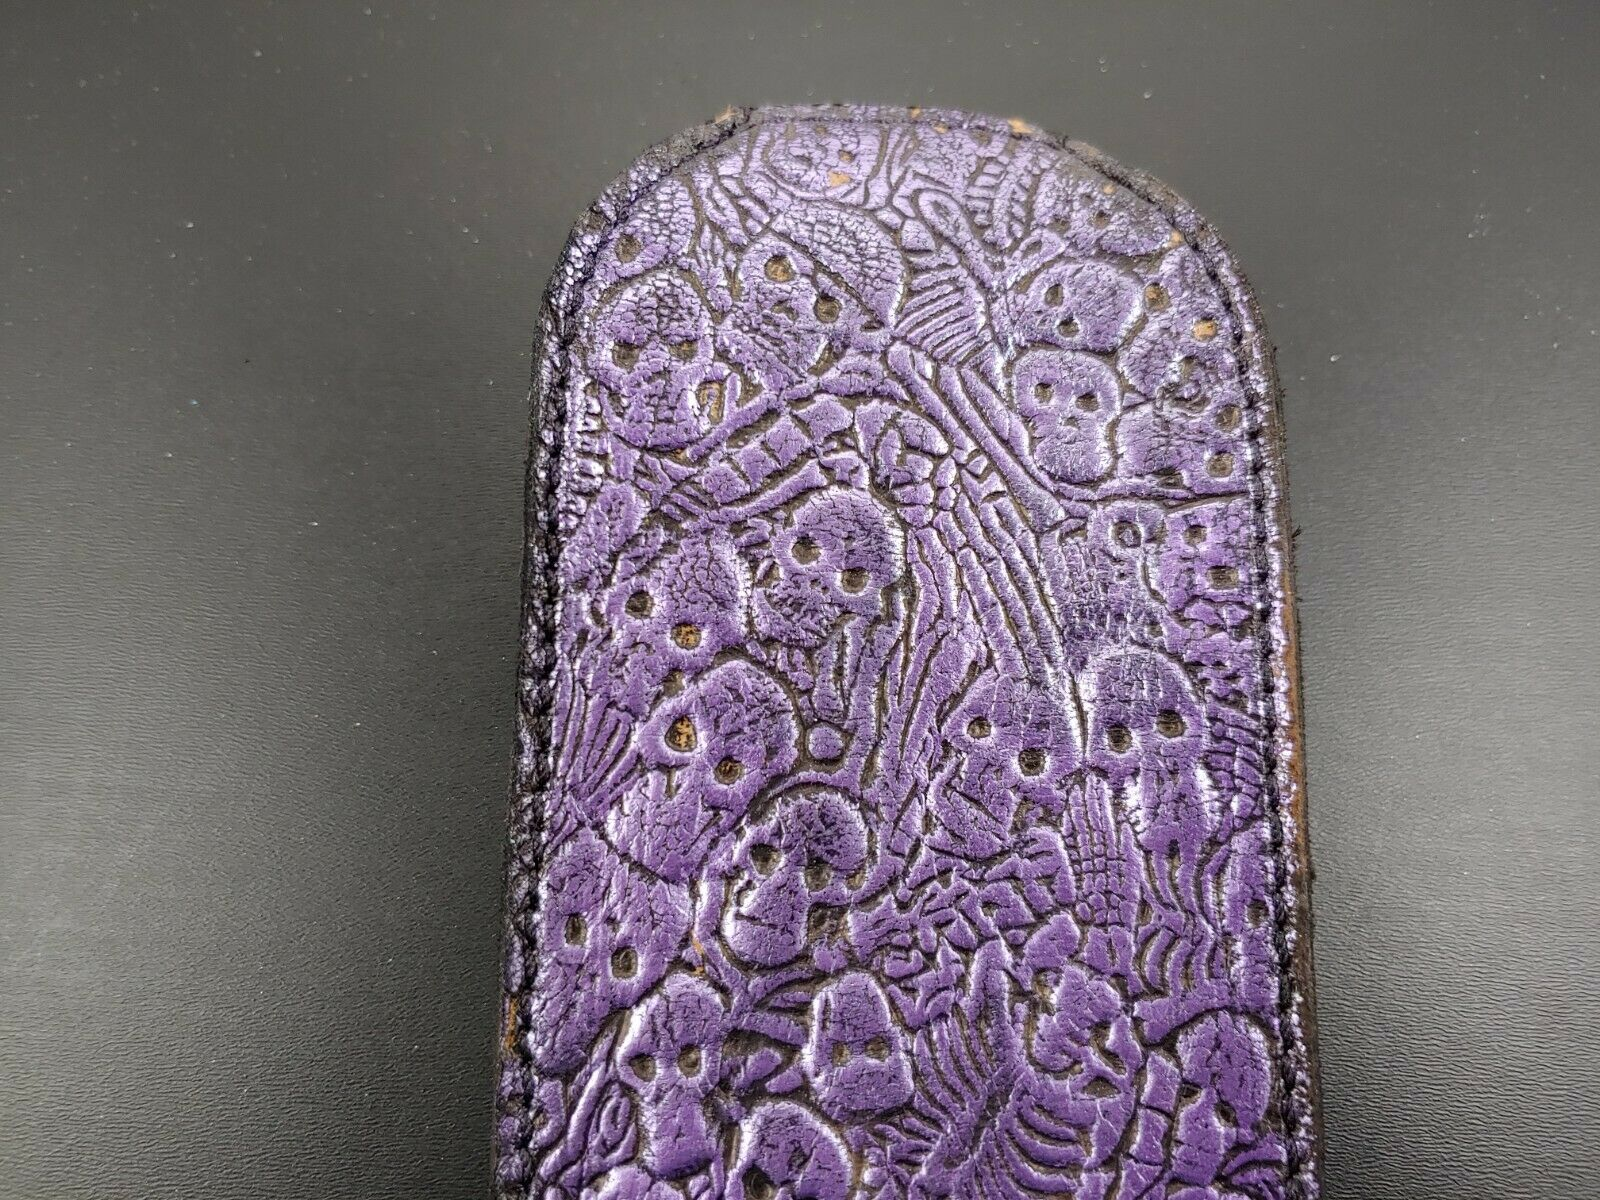 NEW SKULL COIN purse SLAP JACK Tactical leather EDC WALLET sap MOLLE BELT POUCH